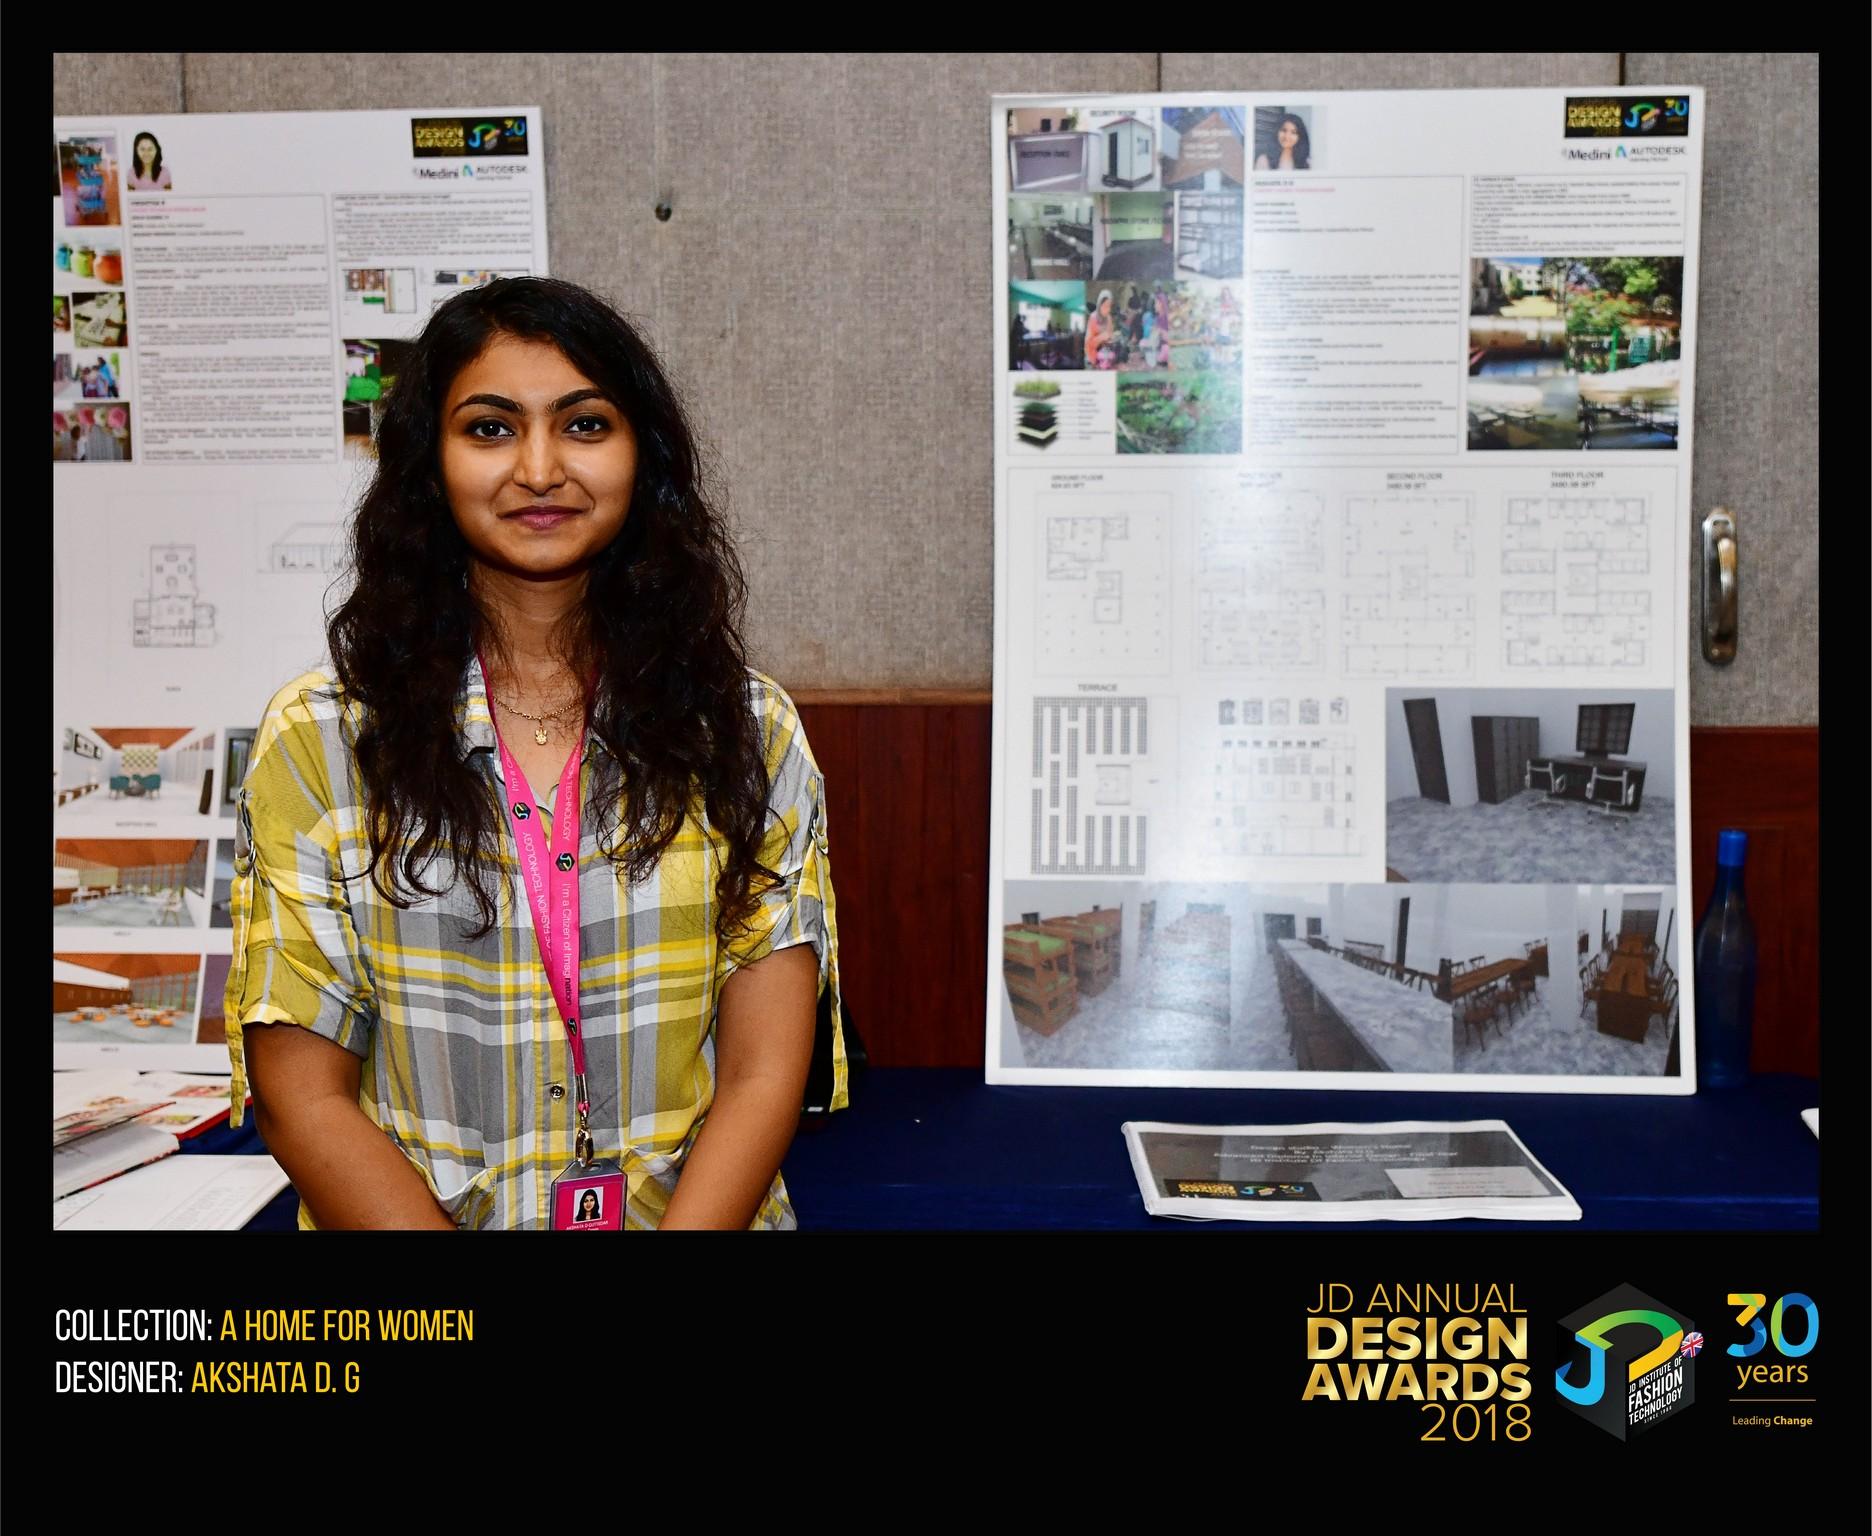 a home for women - home for women - A home for women – Change – JD Annual Design Awards 2018